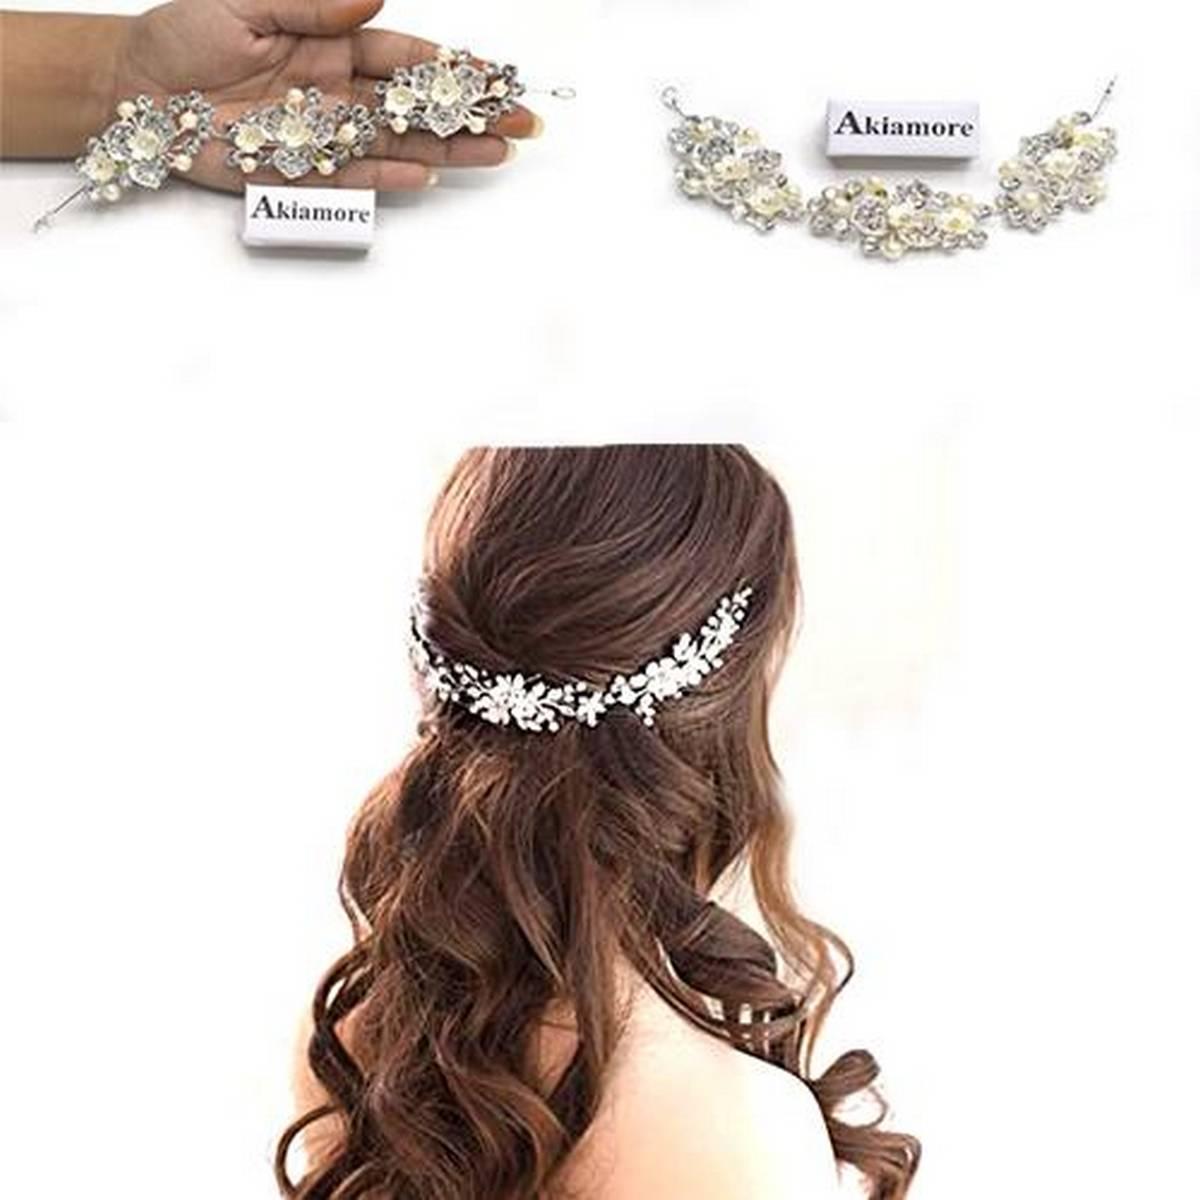 Crystal Pearl Hair Belt Wedding Bridal Hair Ornaments Hair Jewelry Decorations for Brides Wedding Hair Accessories